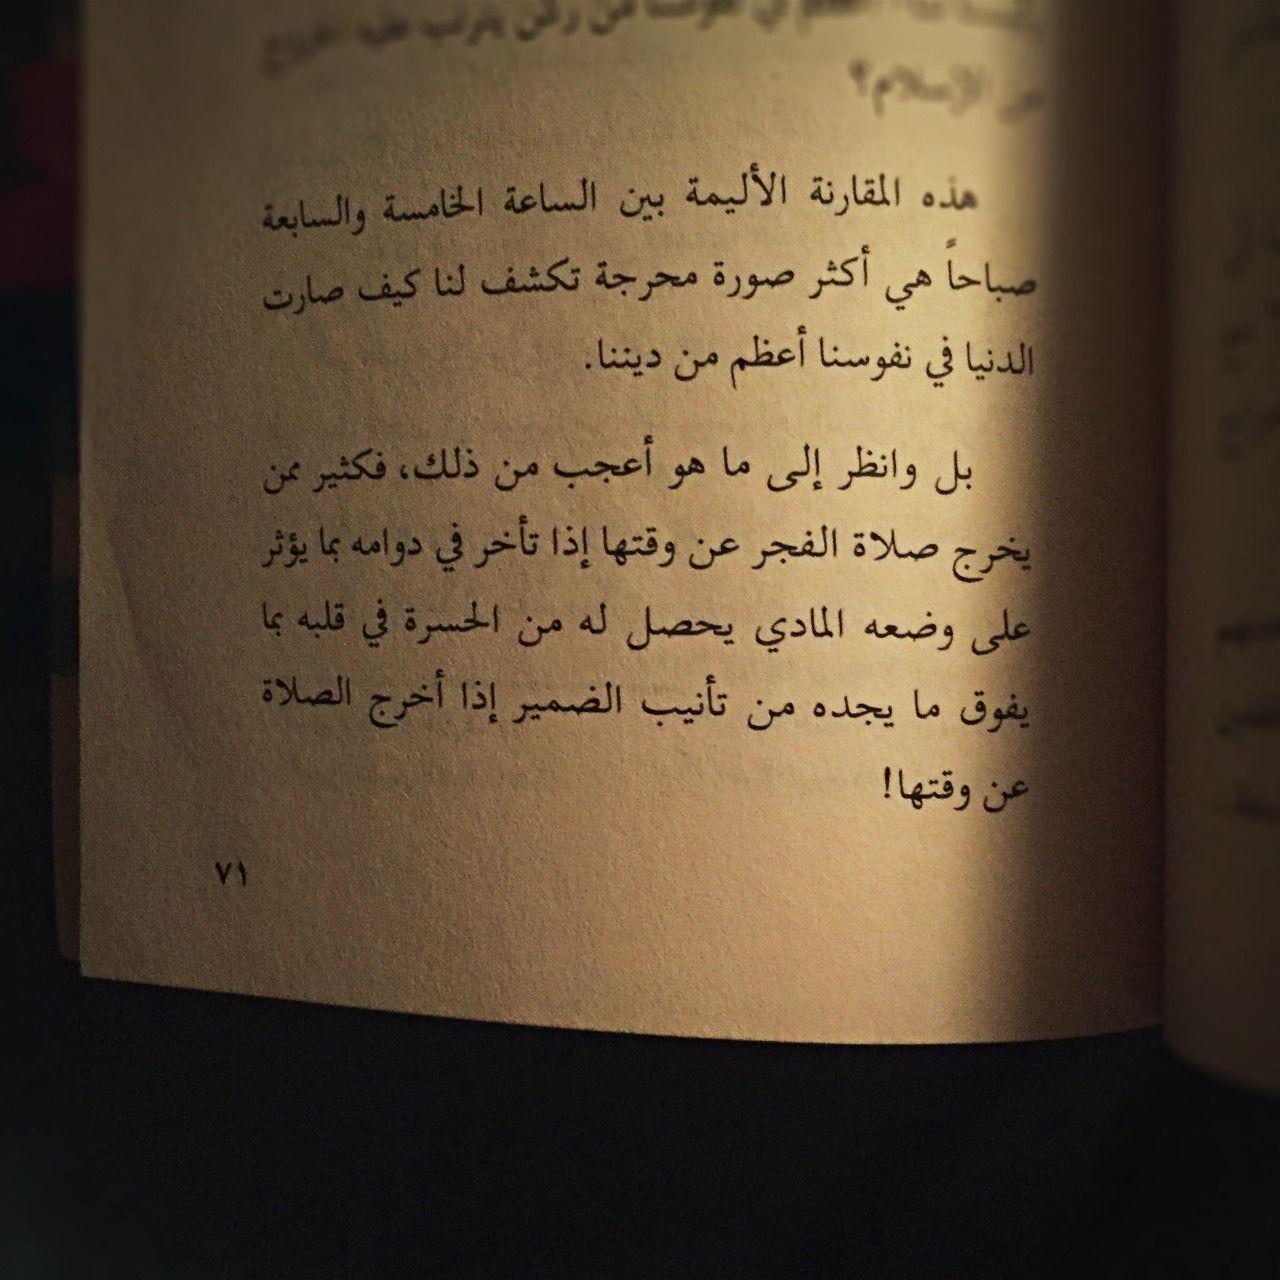 Kwthr58 لماذا نتكاسل عن صلاة الفجر ونستيقظ مهرولين للاعمال والدوام رقائق القرآن ابراهيم السكران Islamic Quotes Prayers Quotes